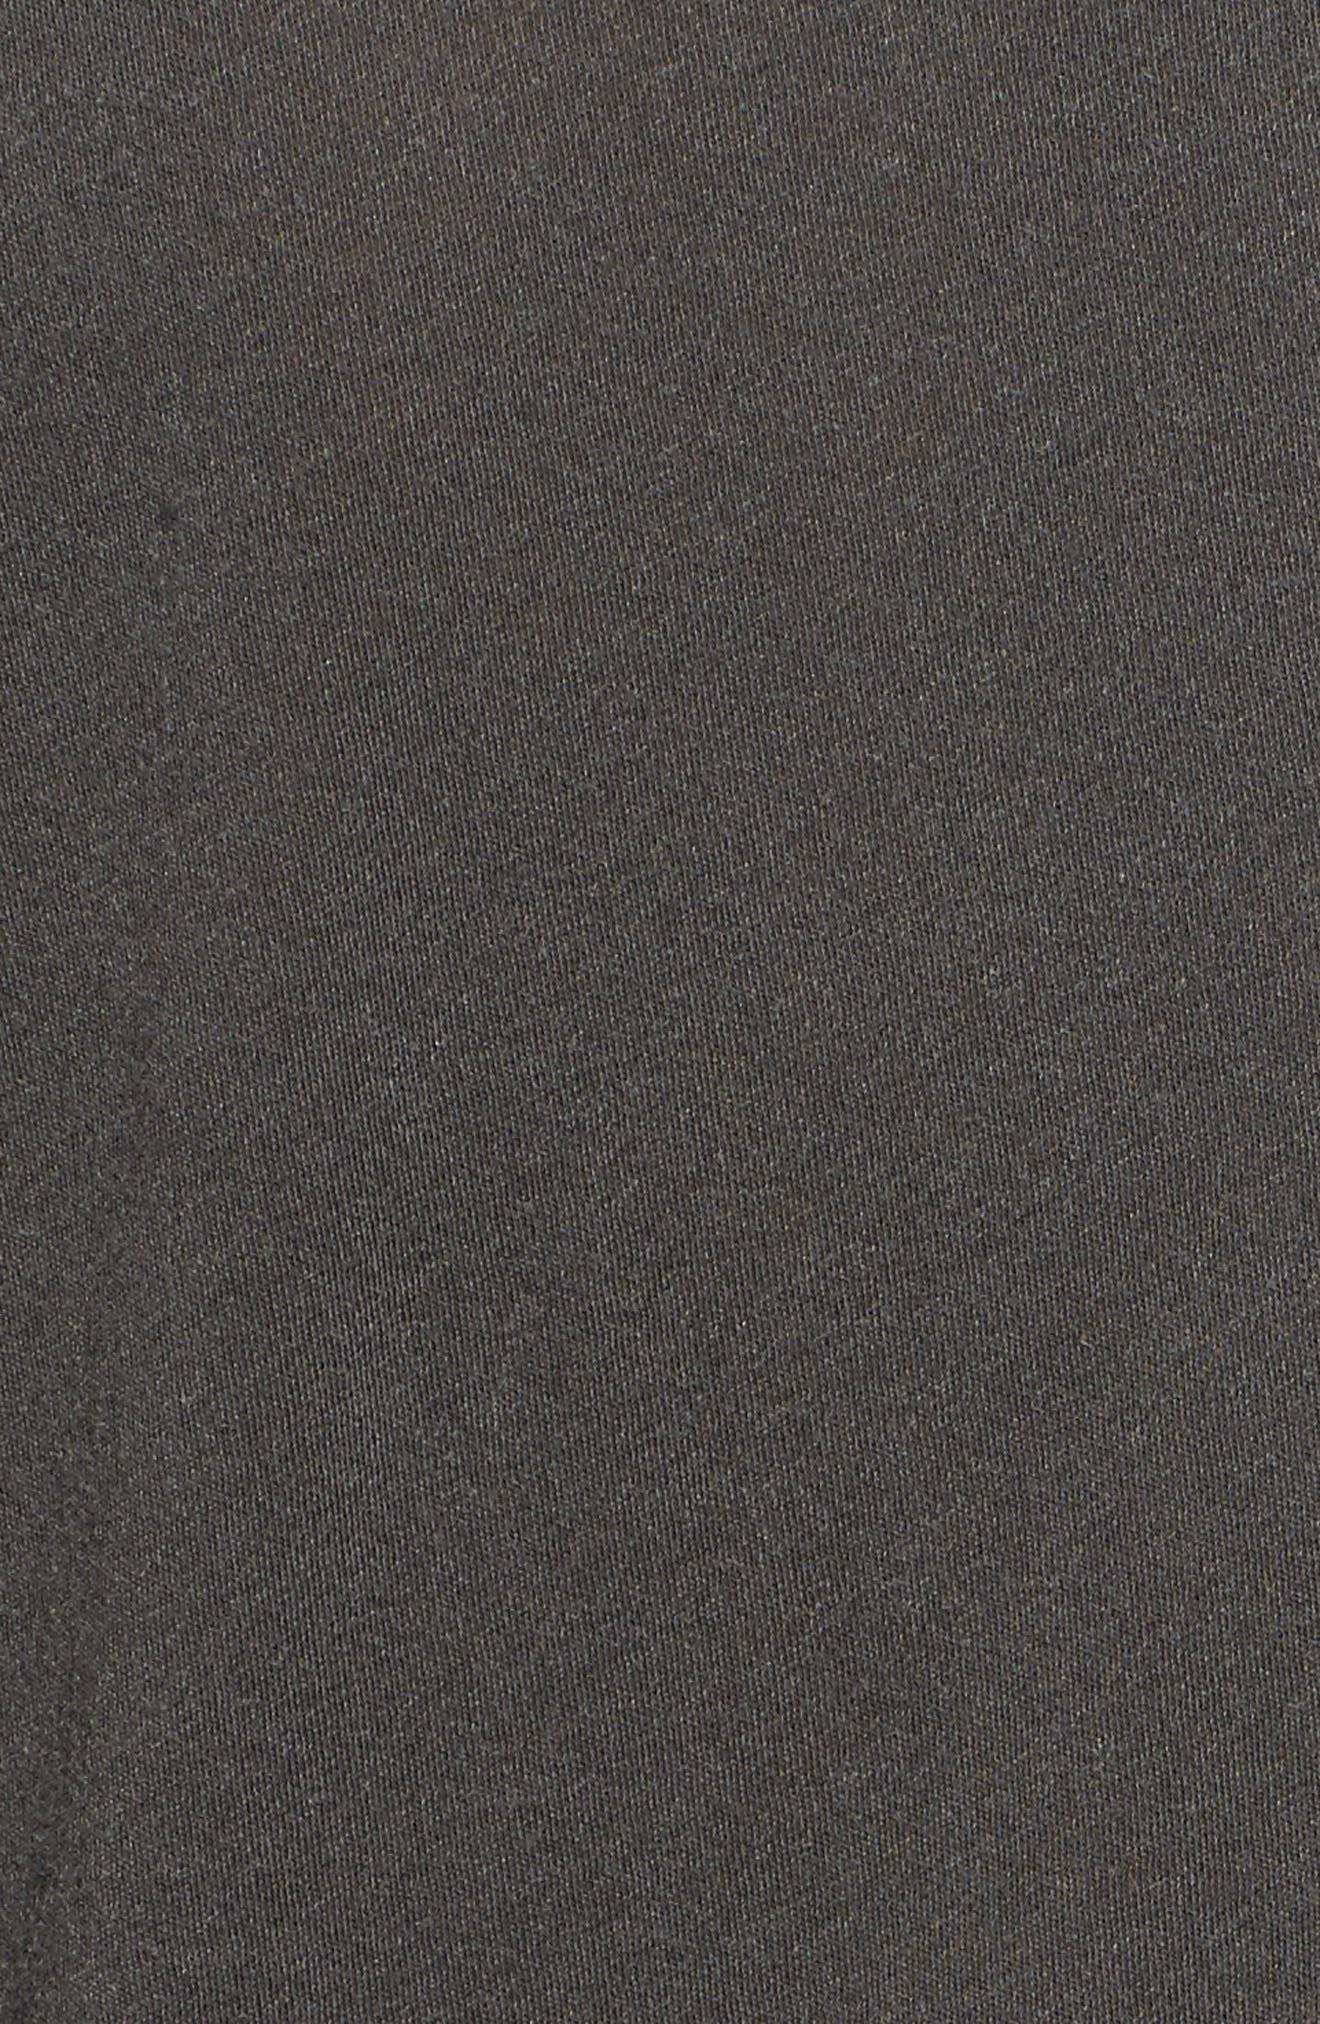 David Bowie Tee,                             Alternate thumbnail 6, color,                             Vintage Black